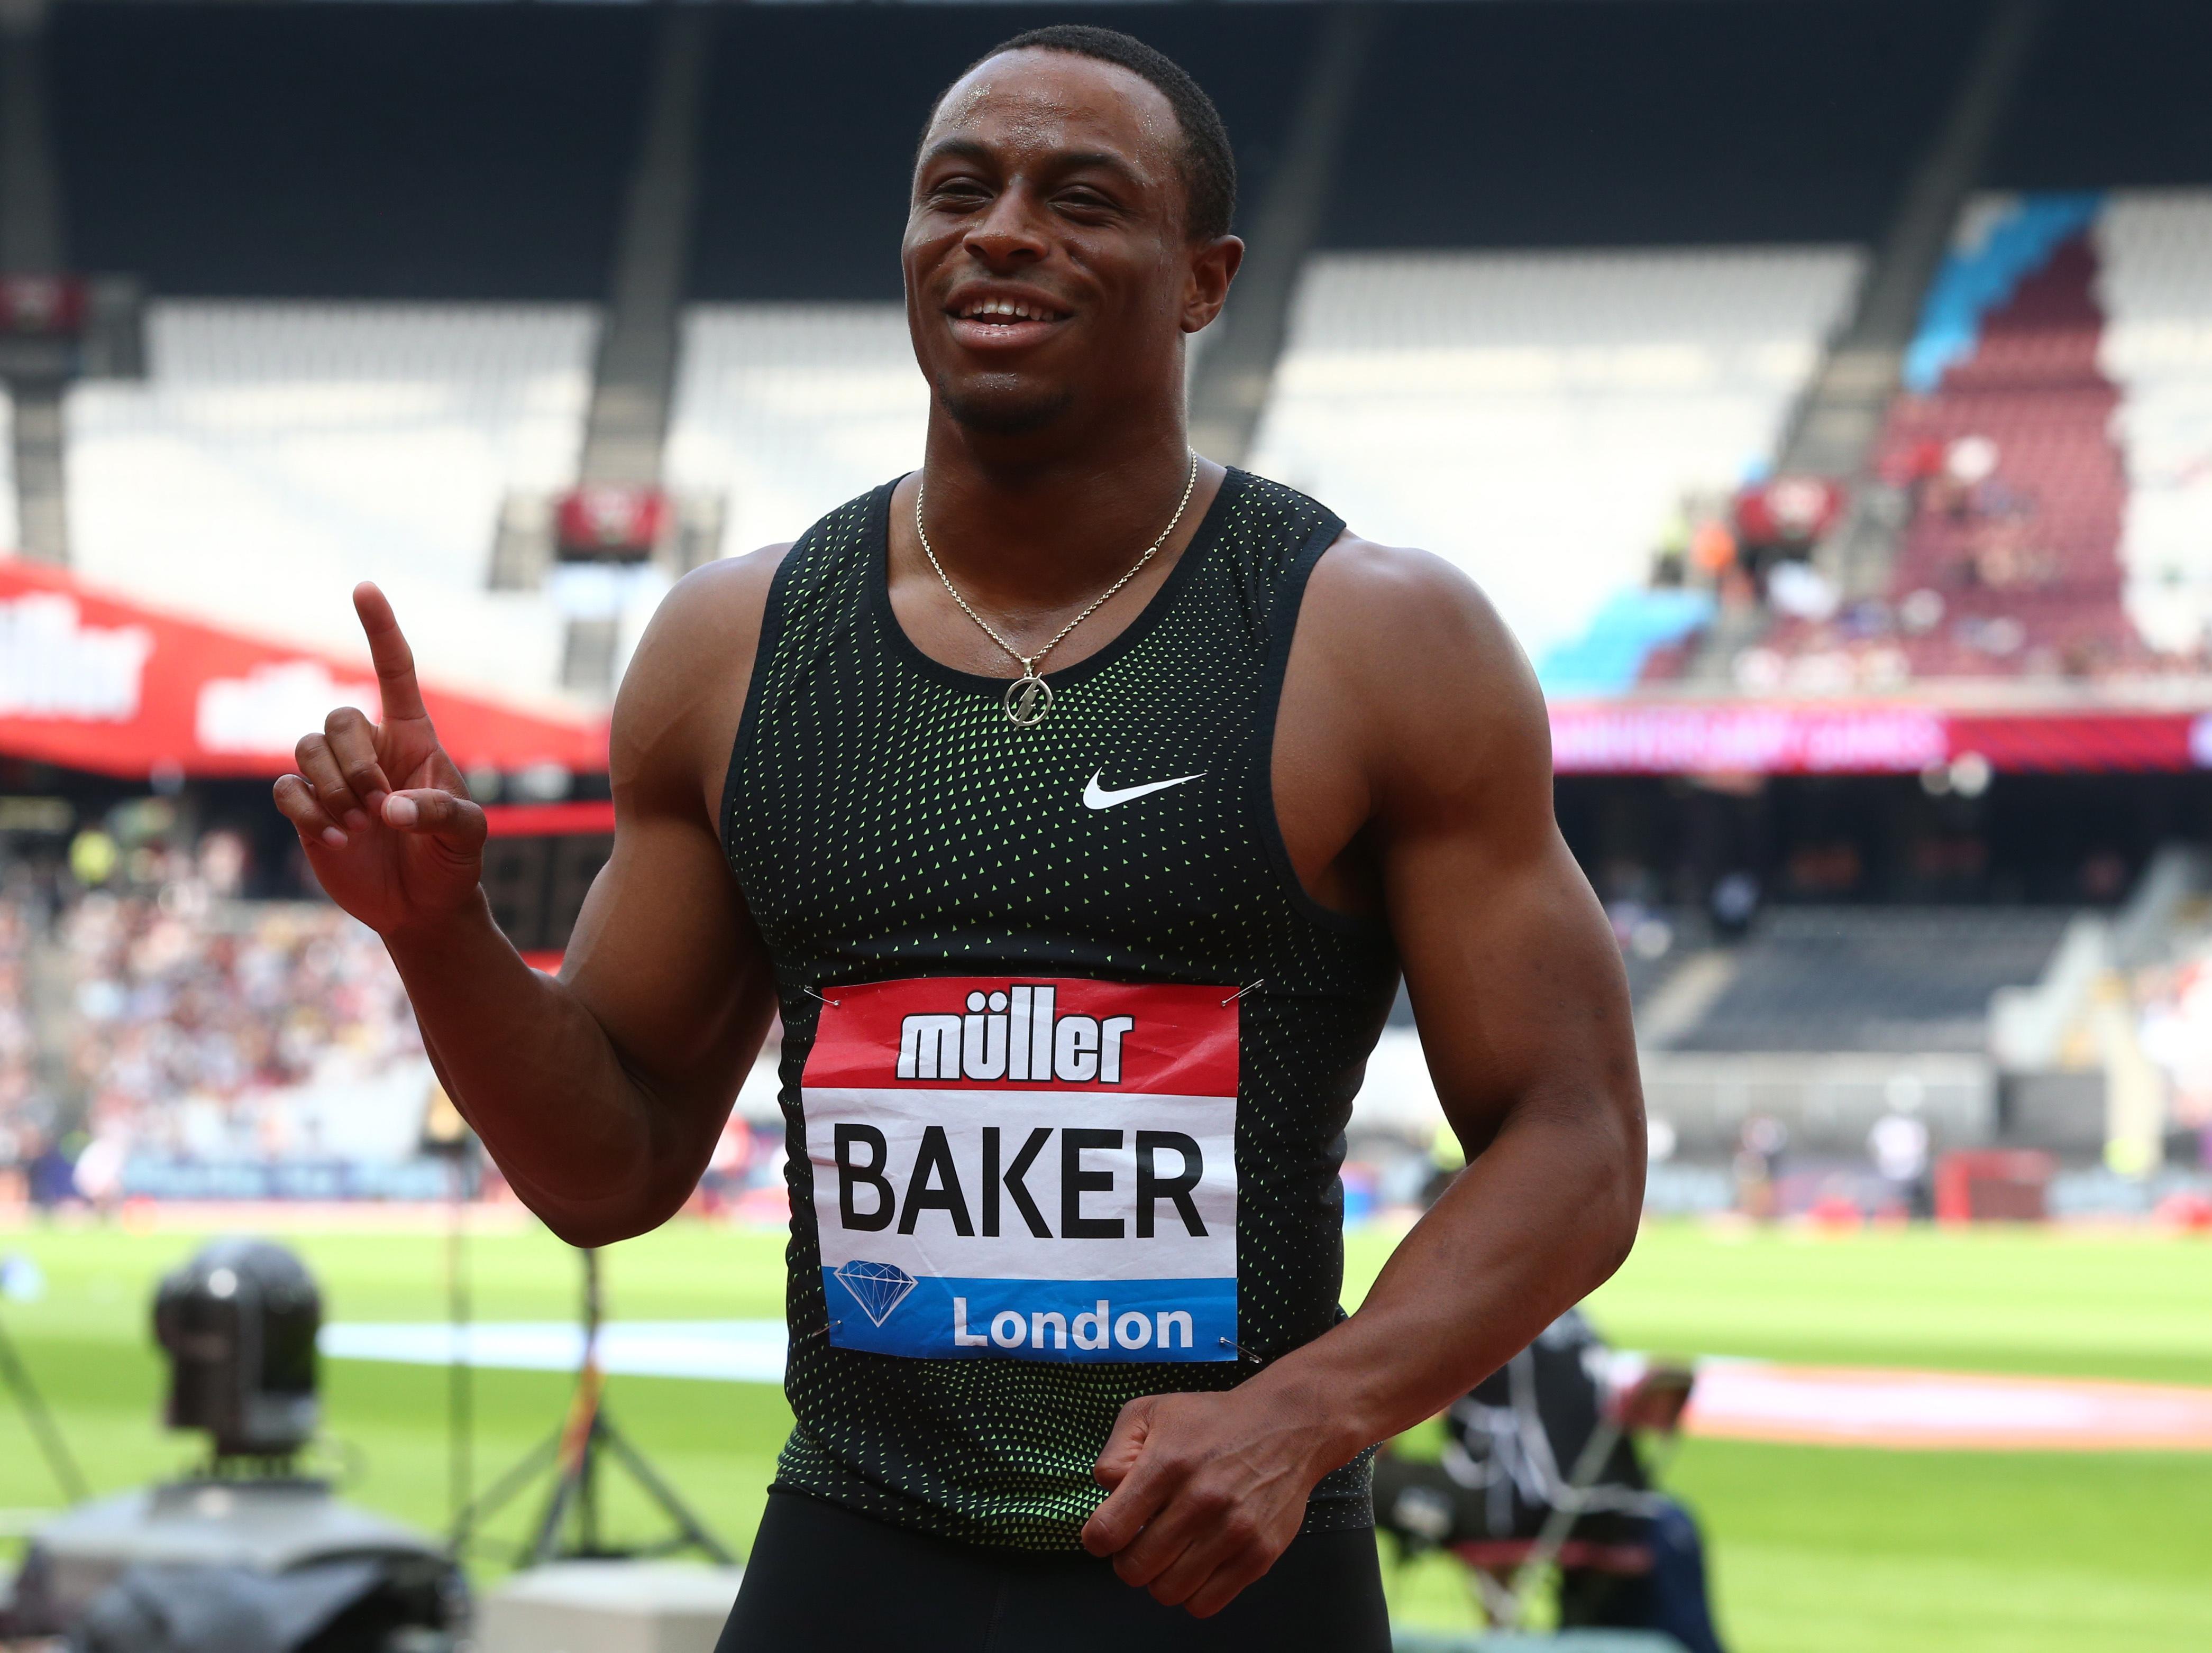 American Ronnie Baker won the sprint race at the London Stadium